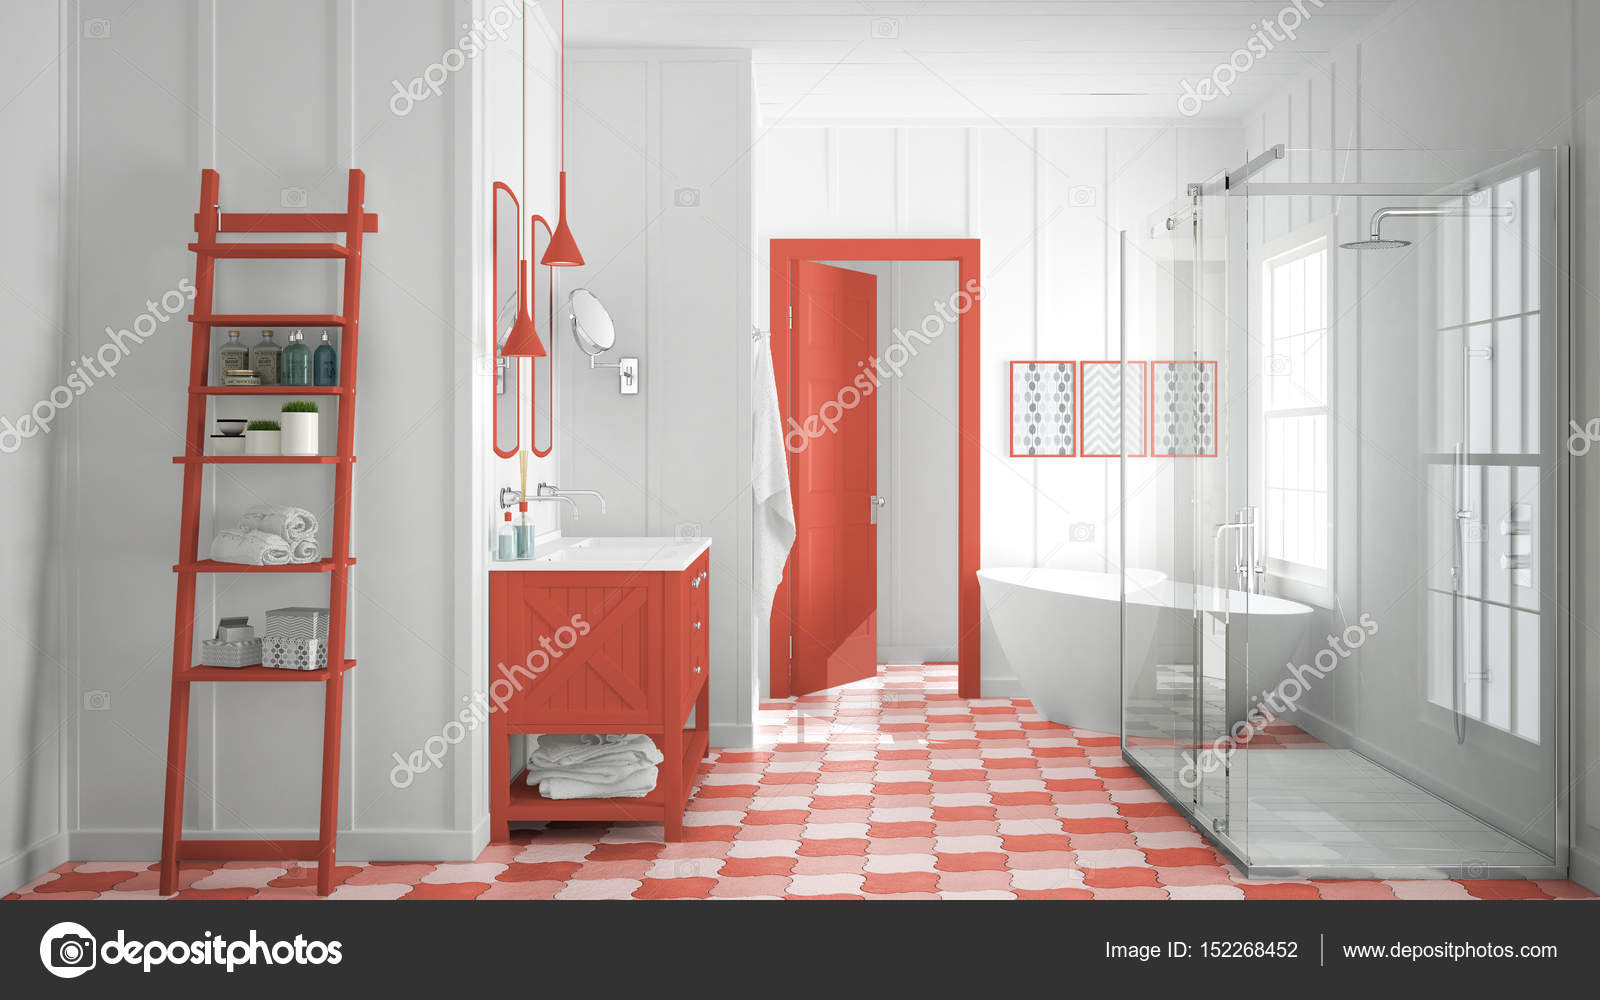 Vasca Da Bagno Rossa : Scandinavo minimalista bianco e rosso bagno doccia vasca da